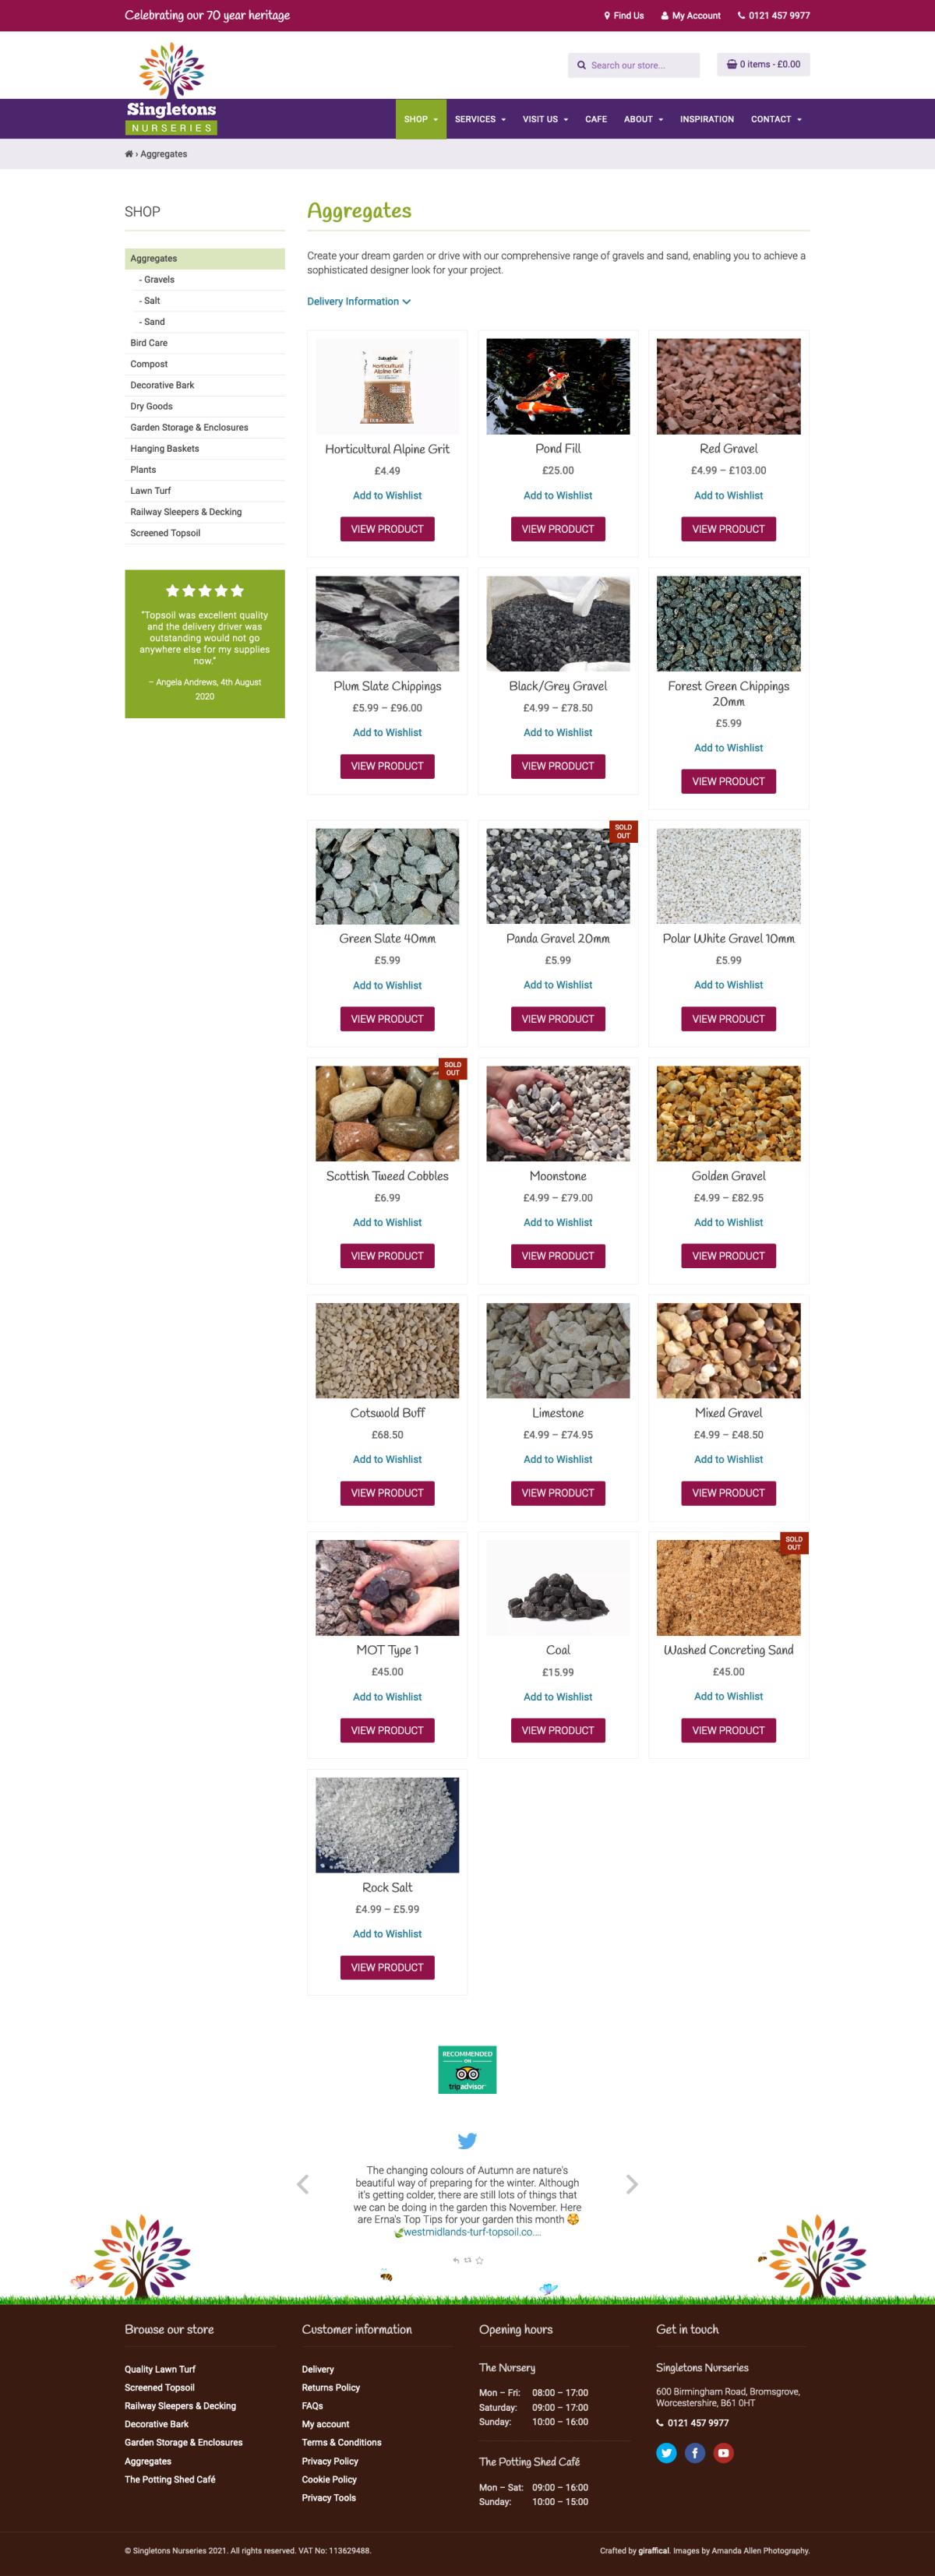 Garden Centre Website Design - Singletons Nurseries - Category Page